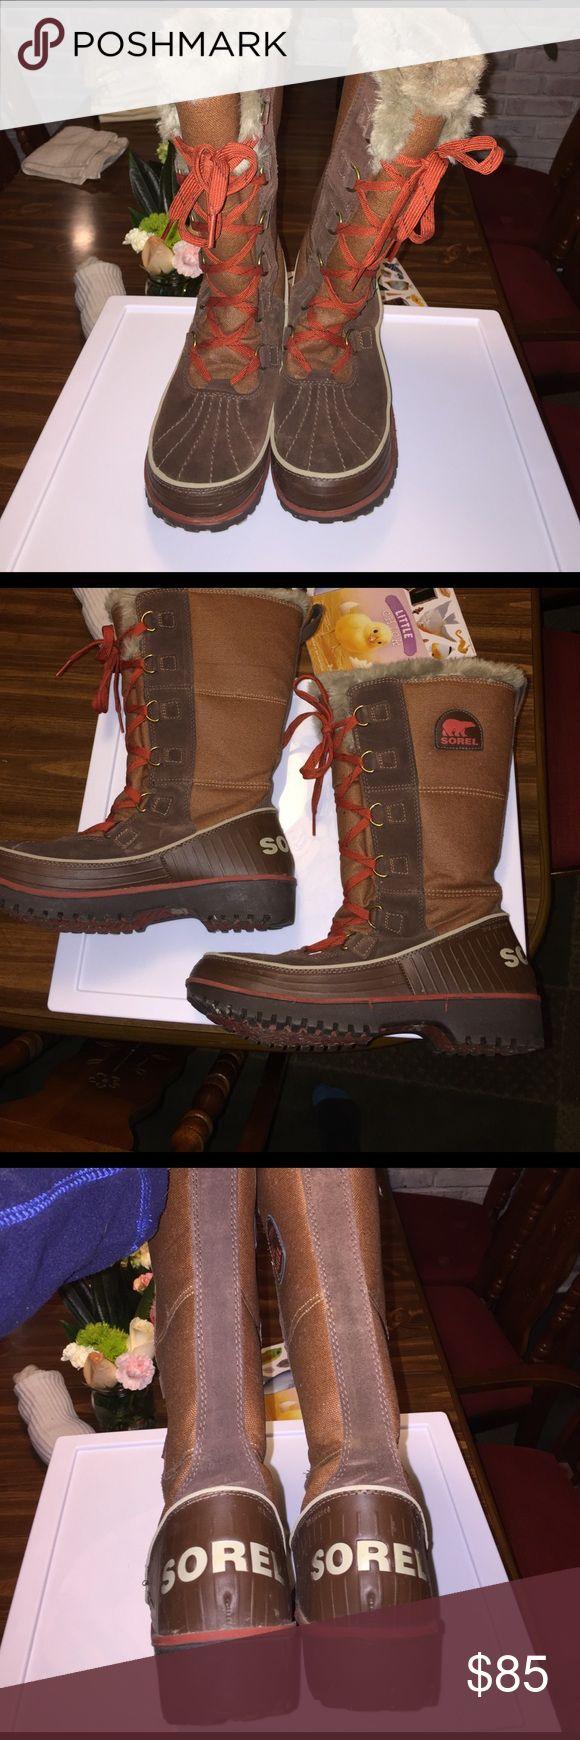 Sorel tivoli boots sz 9 Sorel Tivoli tall boots. Worn twice! Browns and a reddish orange lace. GORGEOUS snow boots! Size 9 women's Sorel Shoes Winter & Rain Boots